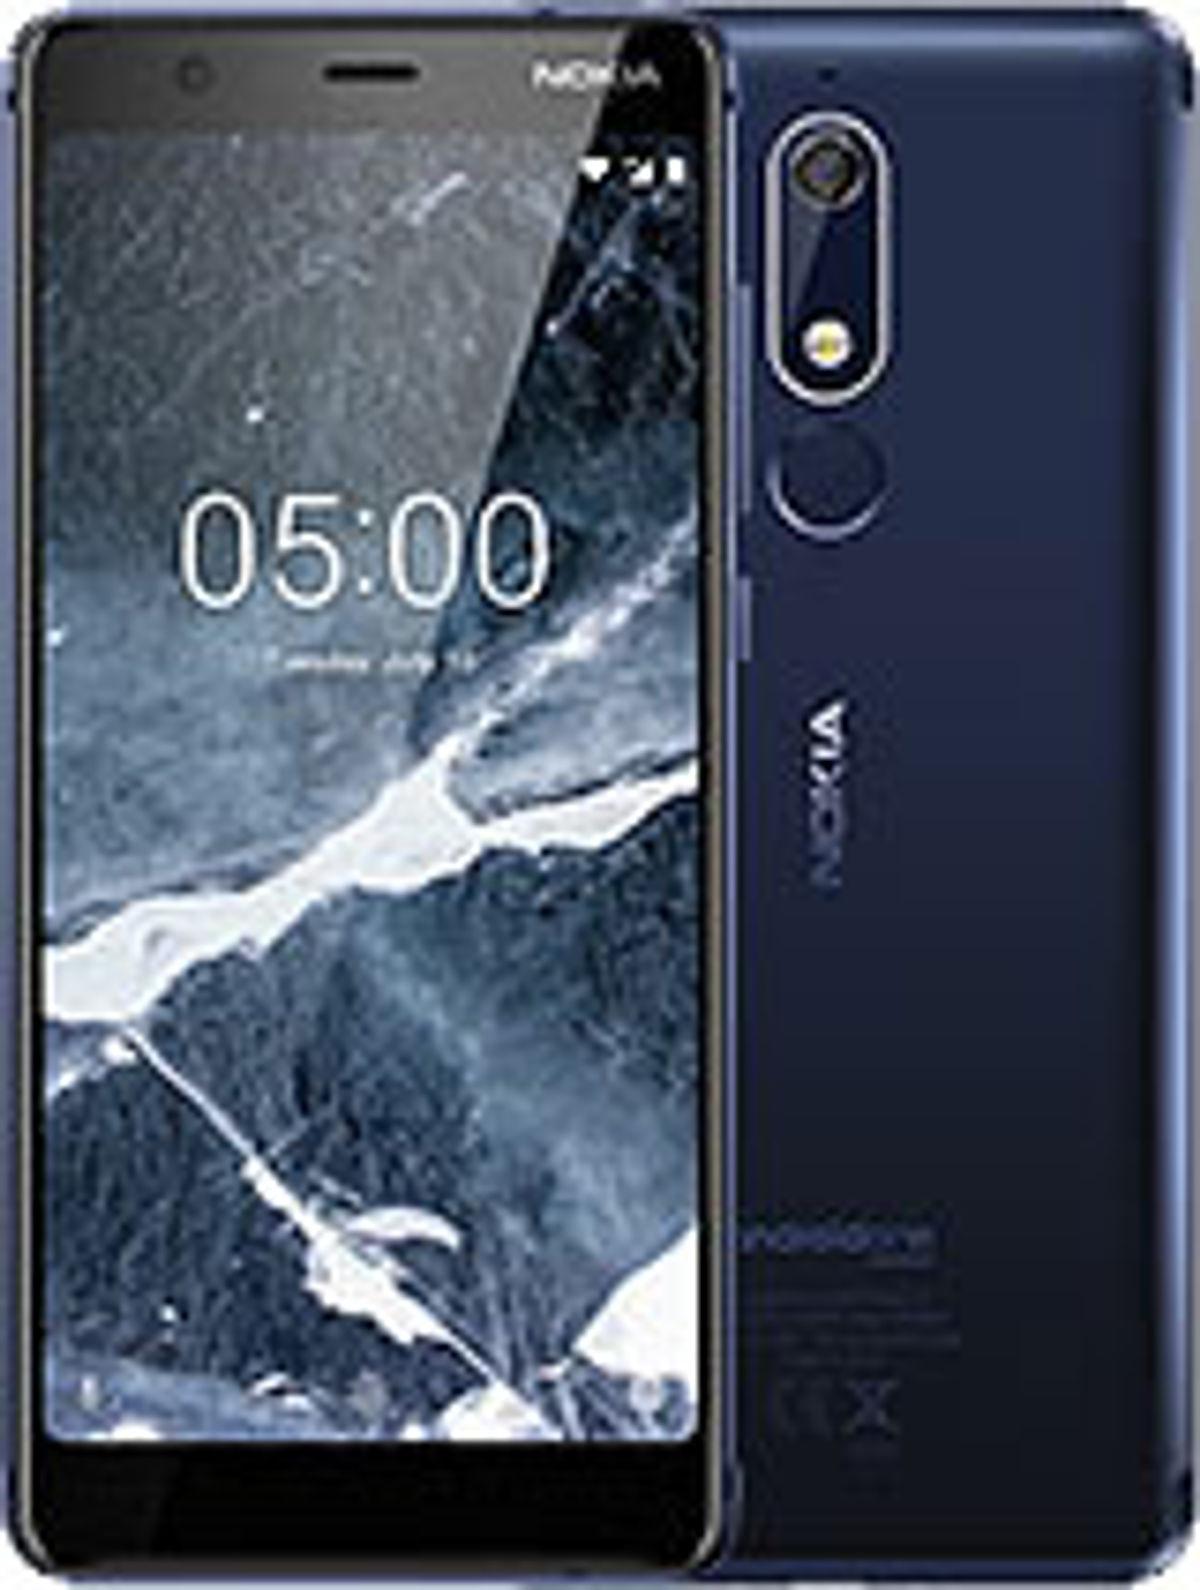 Best Nokia Phones in India September 2019, Latest Nokia